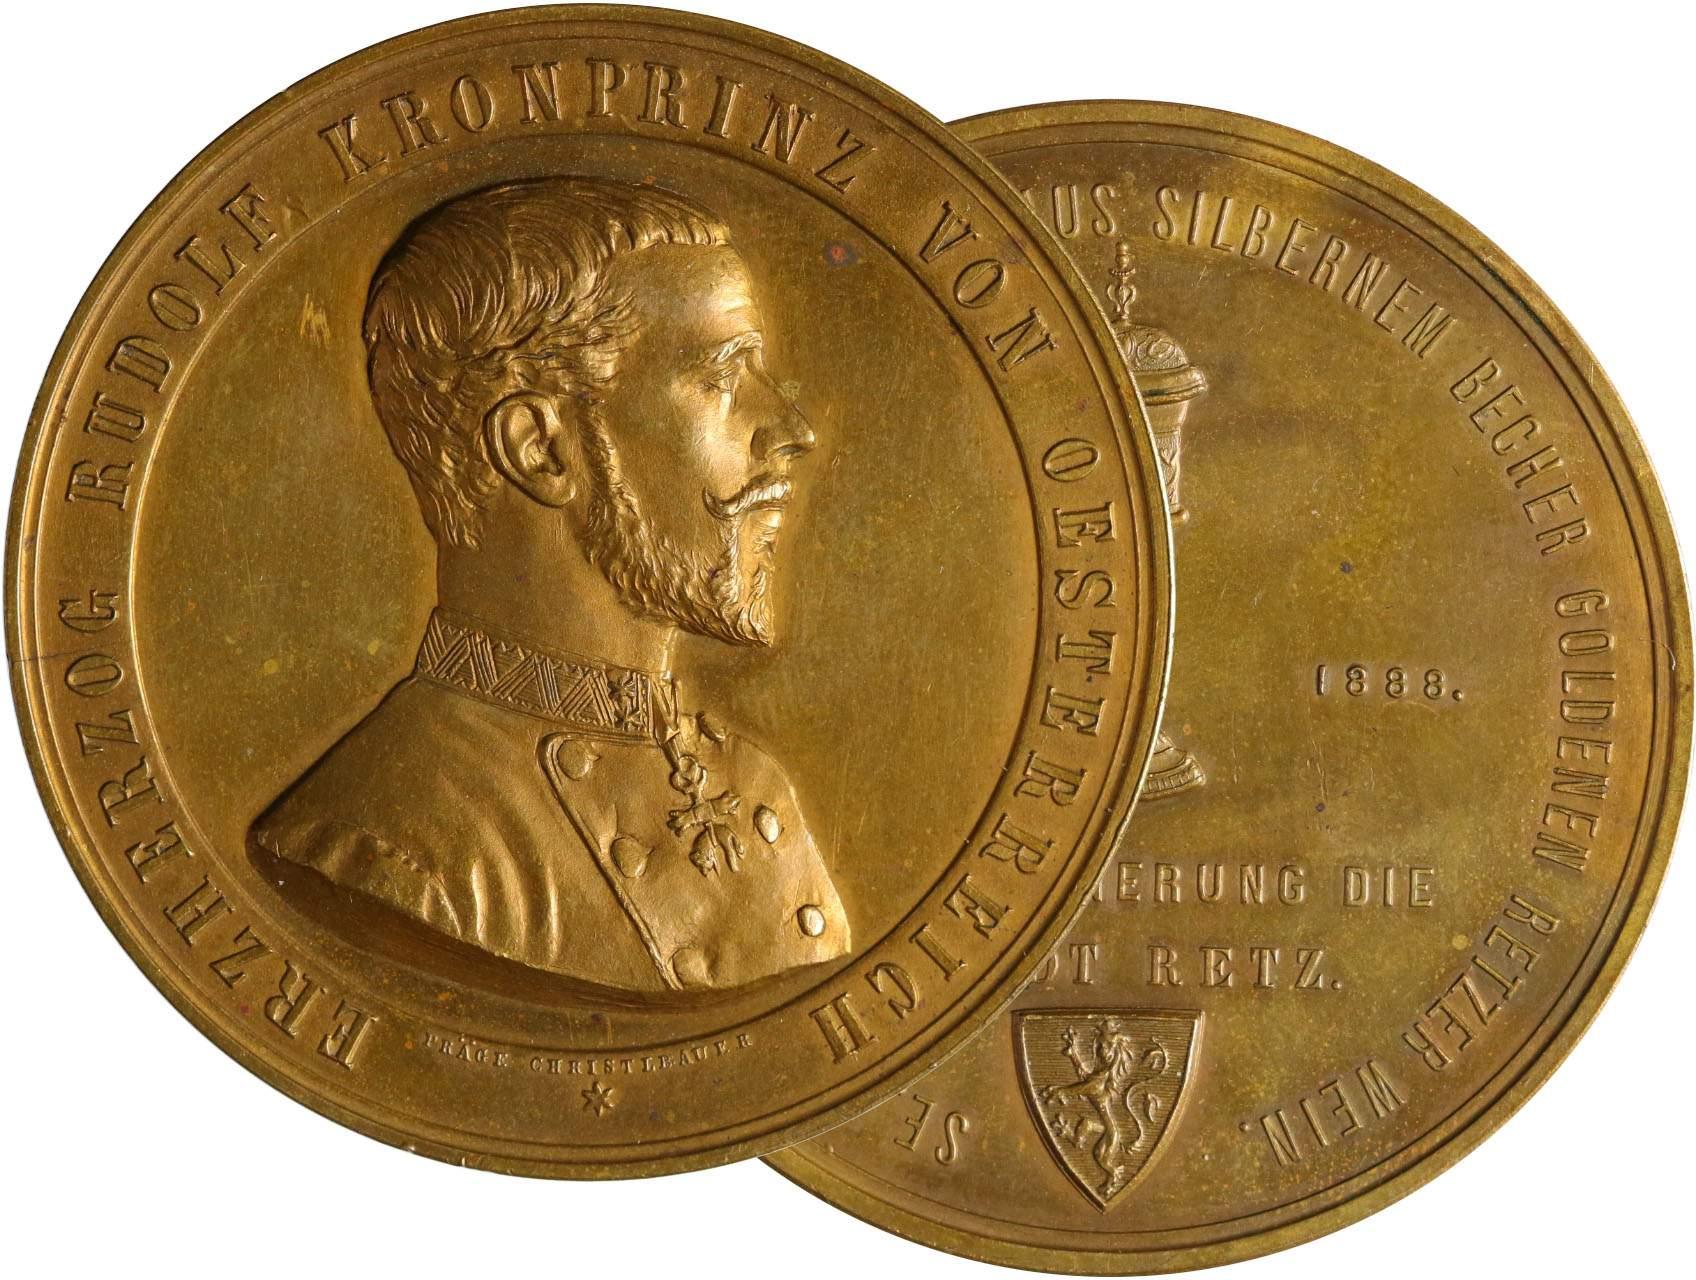 Osobnosti - Rudolf Habsbursko-Lotrinský 1858-1889, AE medaile na návštěvu Retzu 18. duben 1888, poprsí zprava, opis/pohár, znak, opis, značeno PRÄGE CHRISTLBAUER, bronz, 54 mm